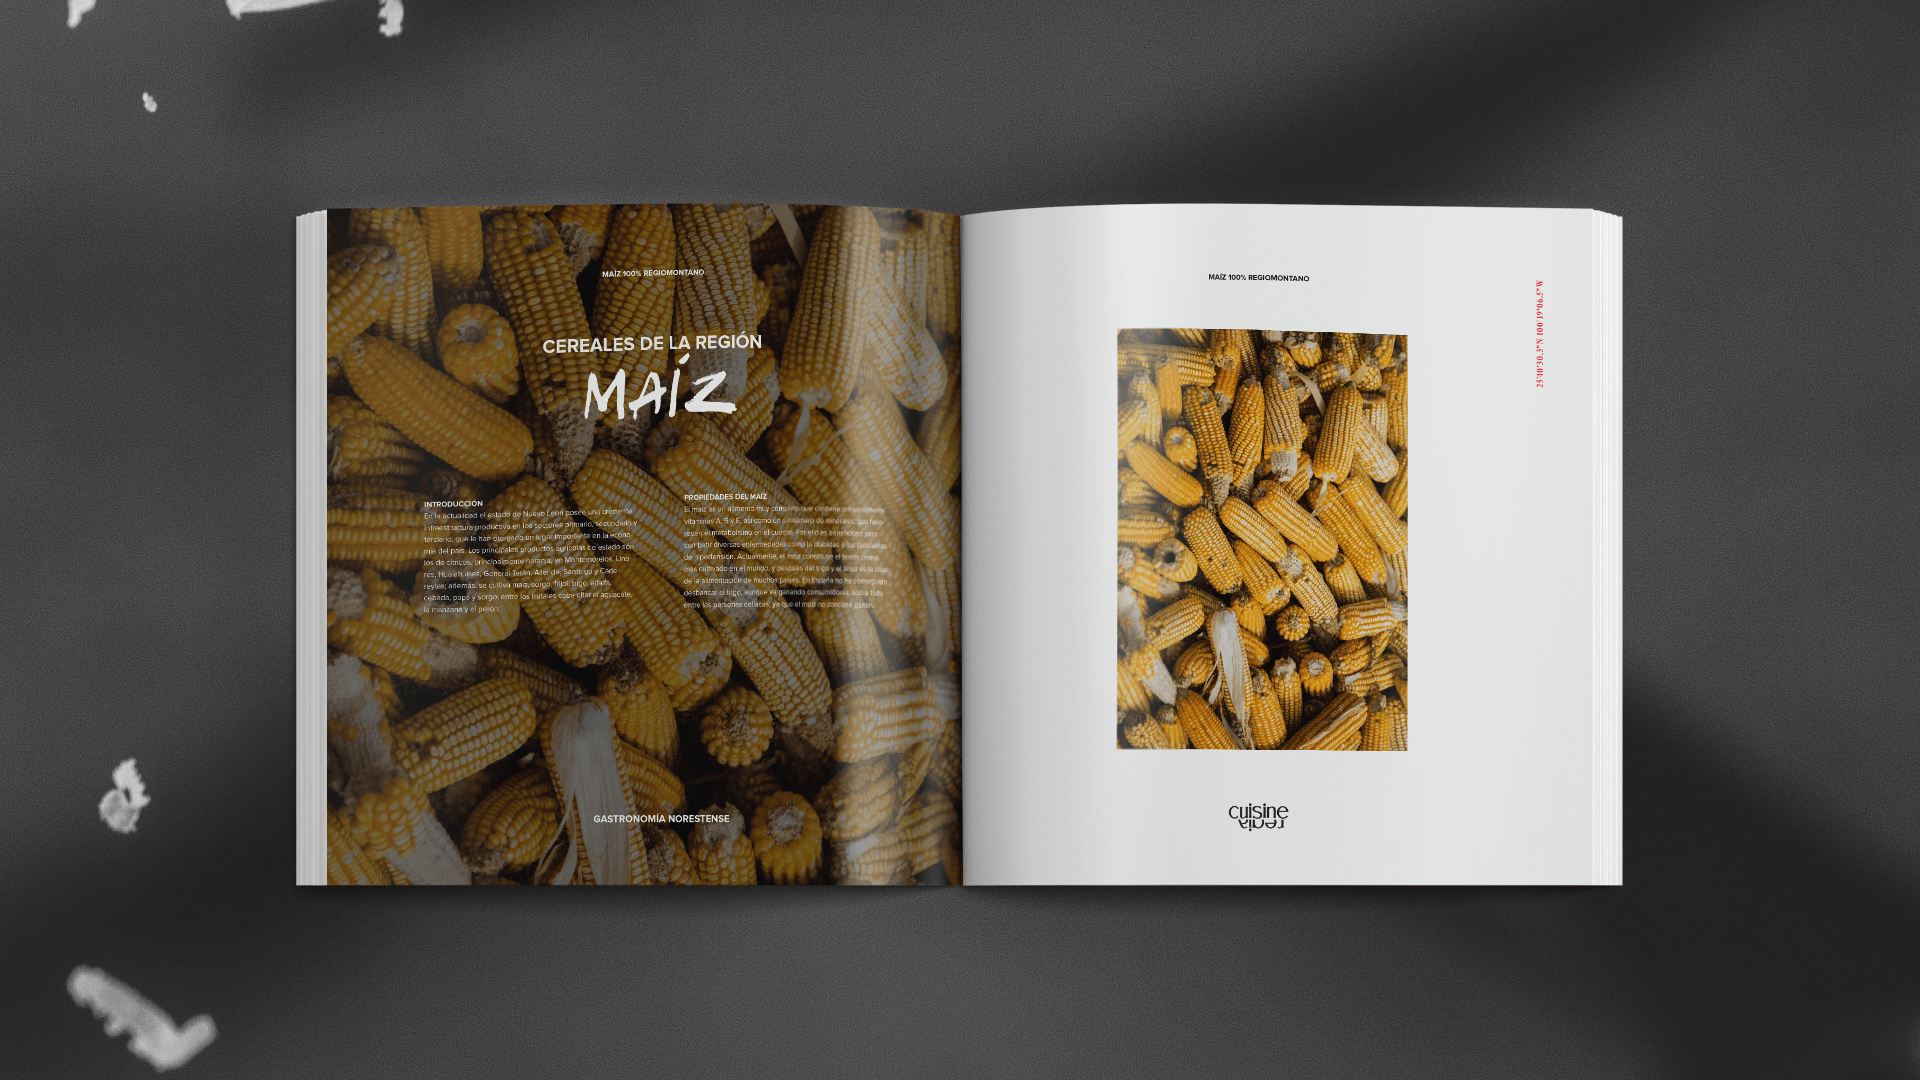 spread26-regia-cuisine-yoenpaperland-compressor